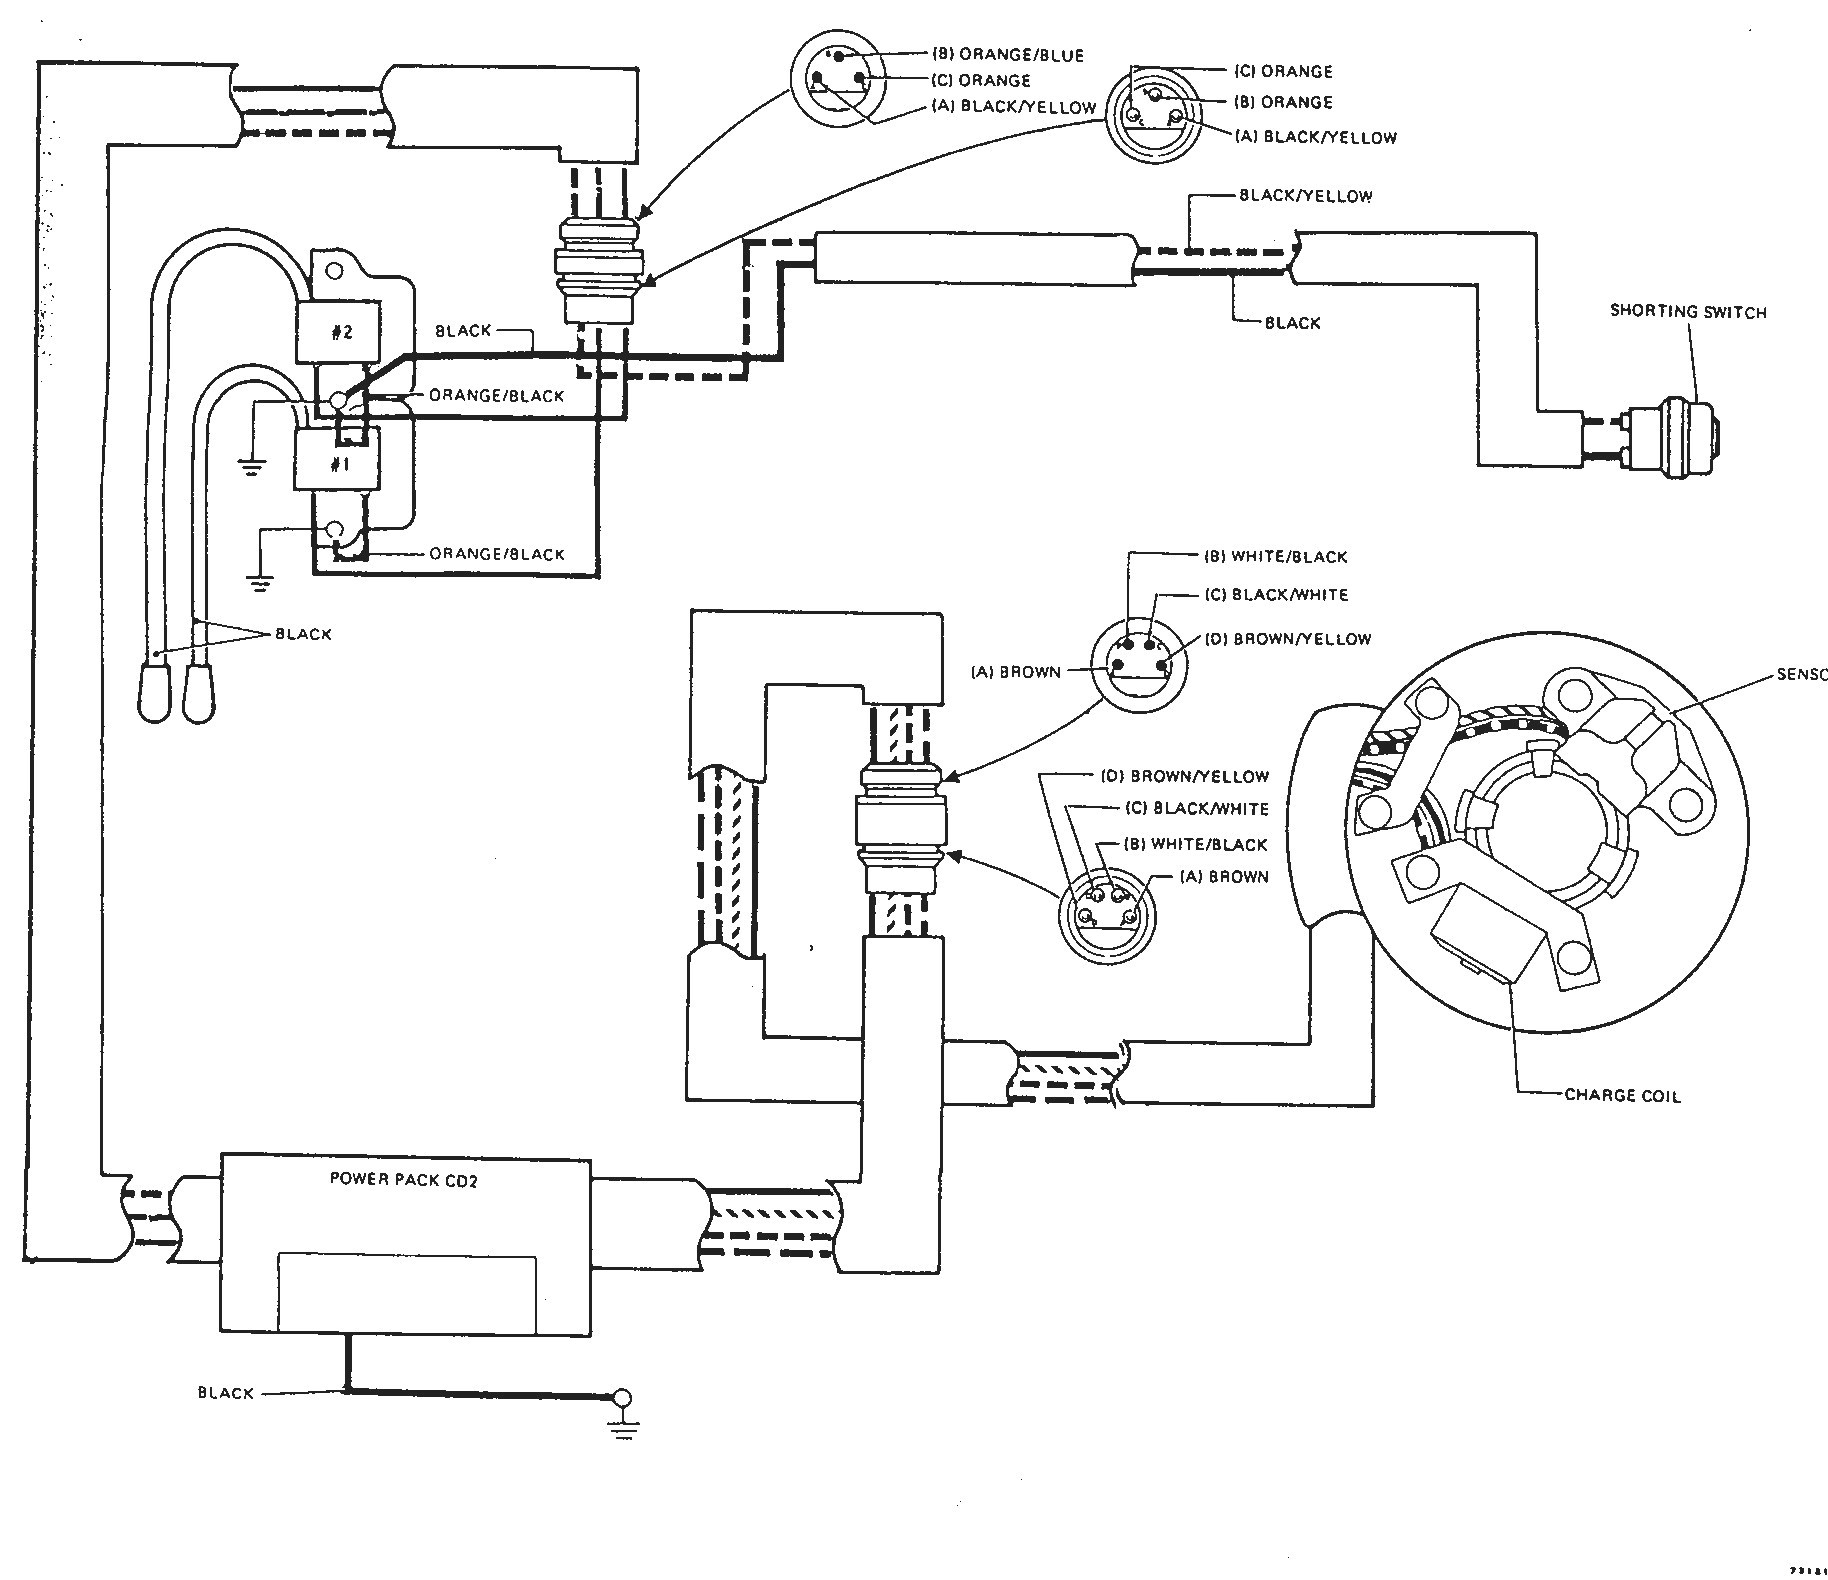 Cutler Hammer Starter Wiring Diagram Motor Diagram Fabulous Starter Motor Wiring Diagram Diagrams Of Cutler Hammer Starter Wiring Diagram